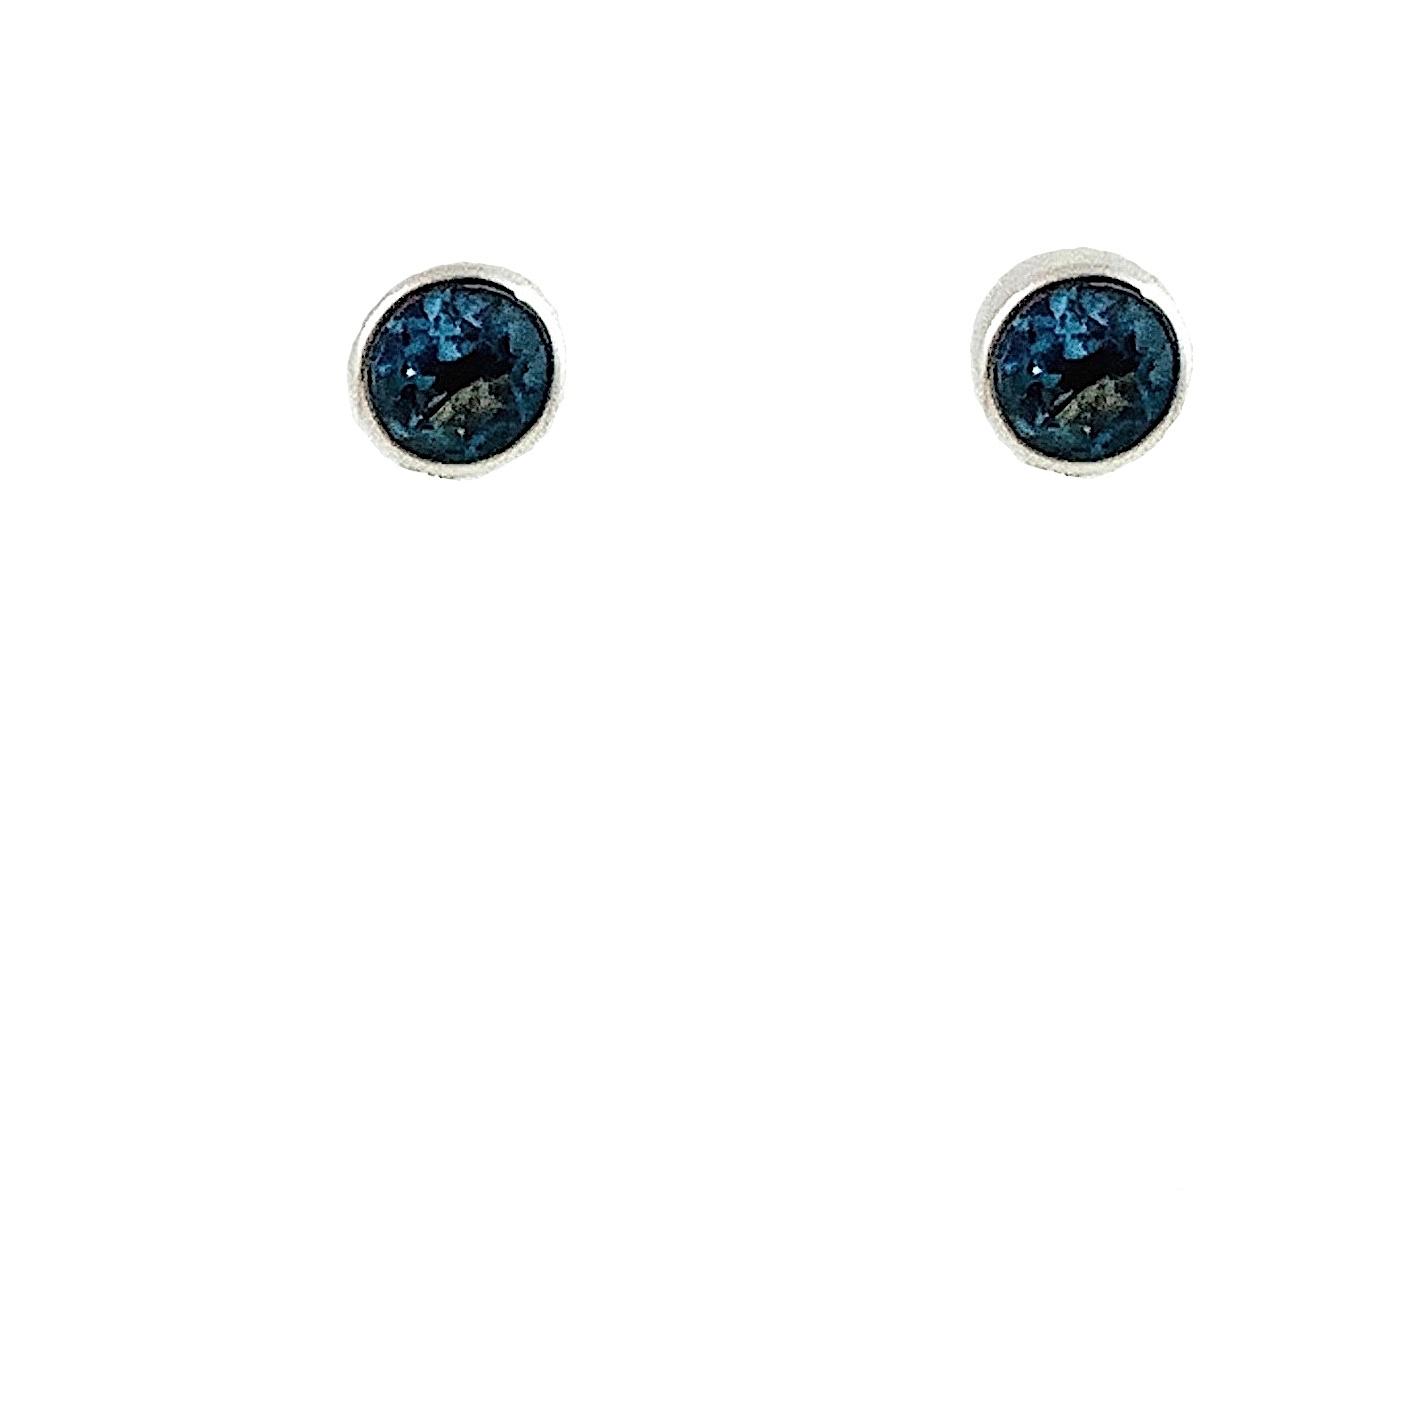 Kiliaan Jewelry Collectie Oorsteker Londen blue topaas